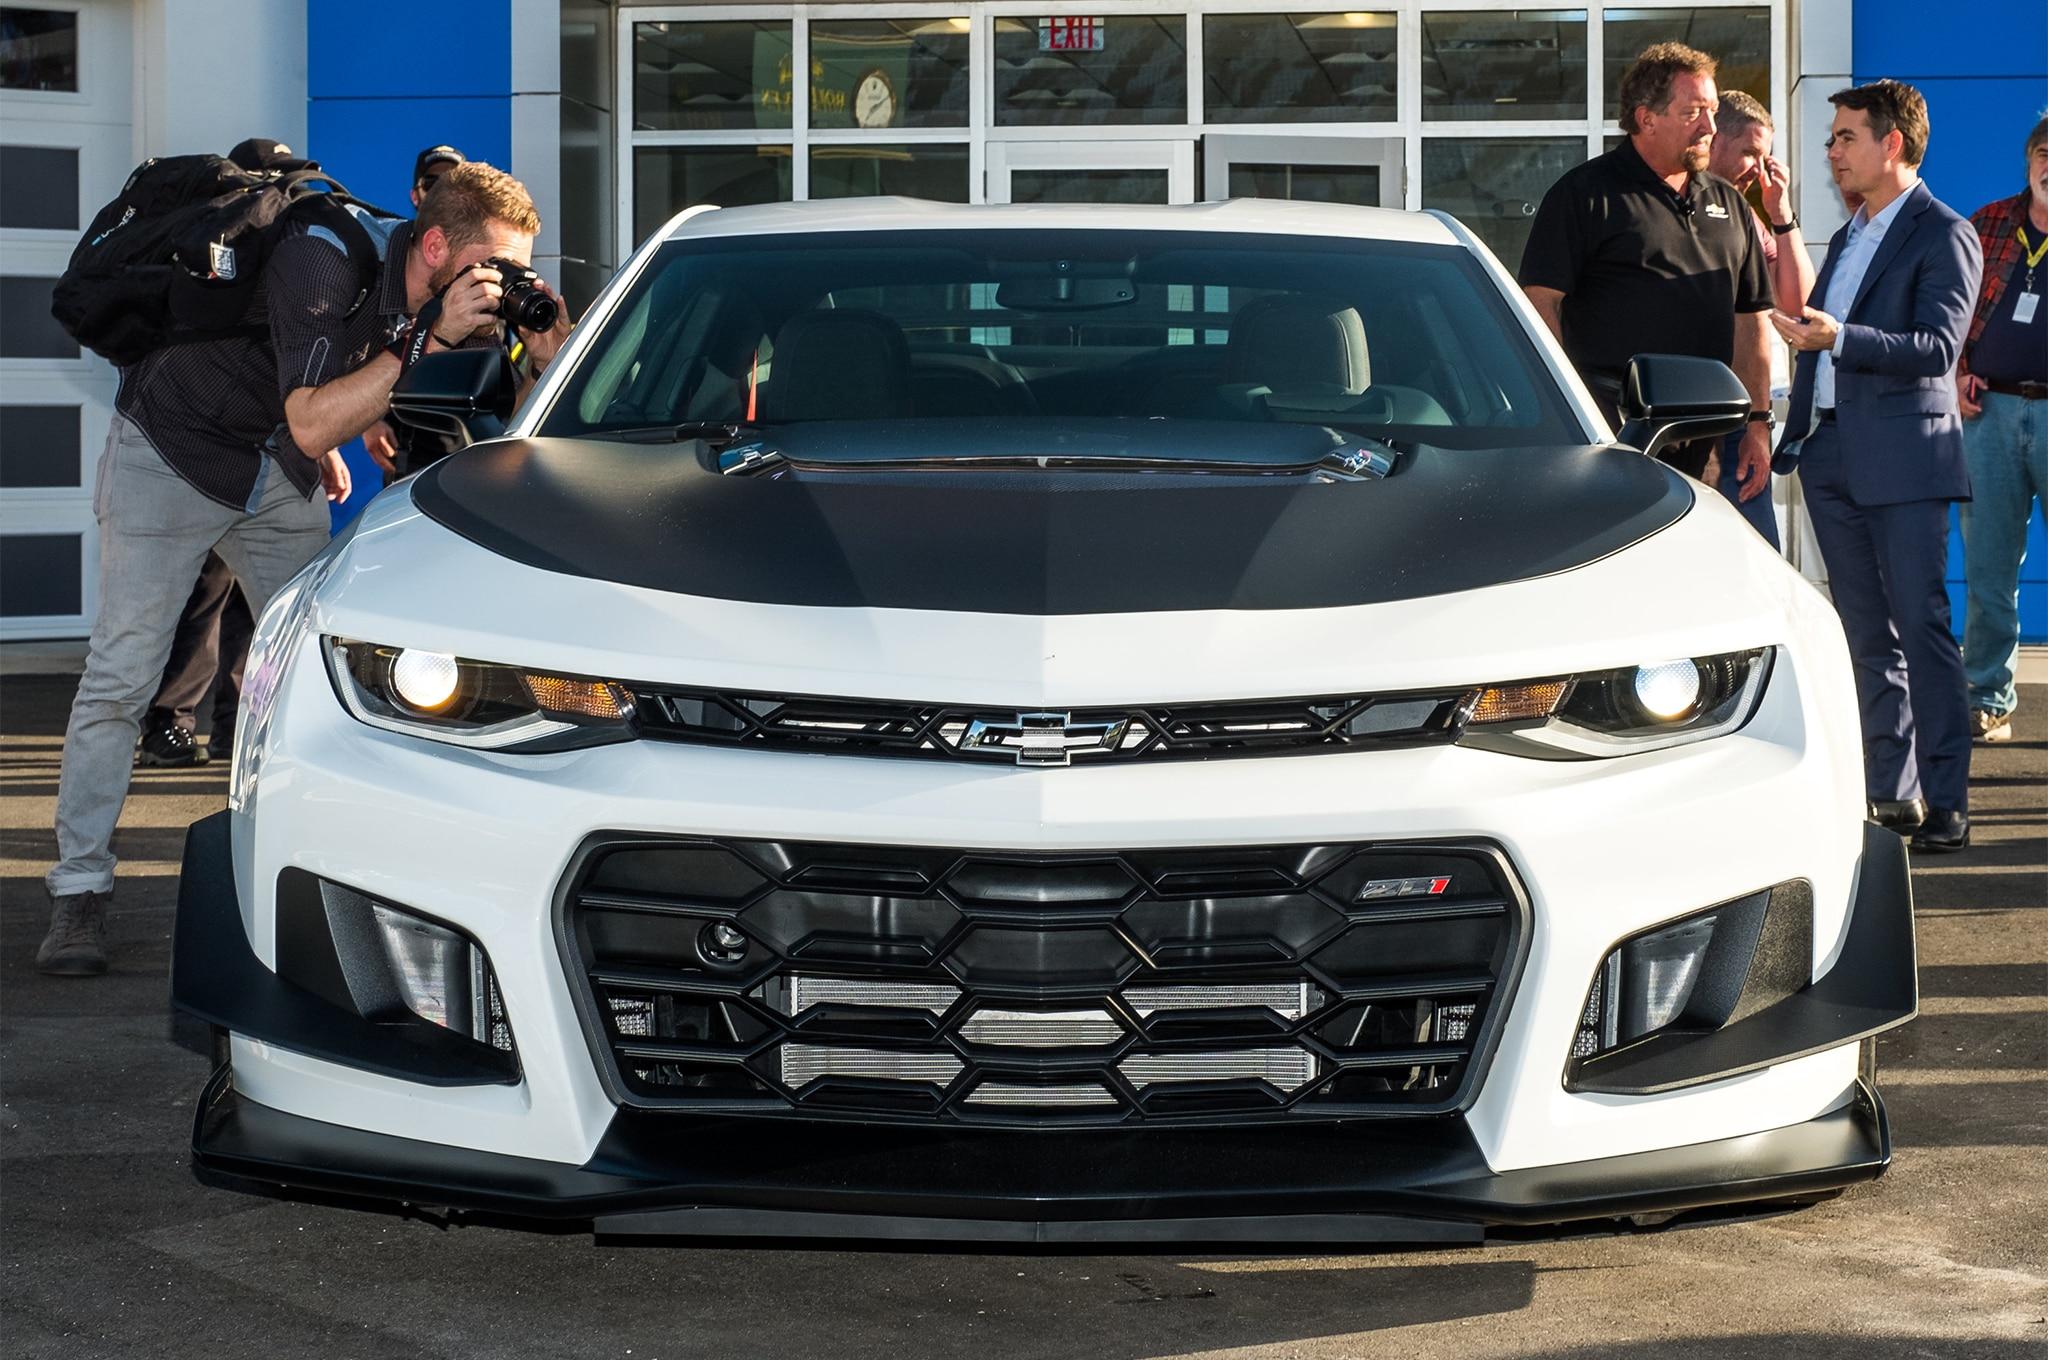 Say Hello To The 2018 Chevrolet Camaro Zl1 1le